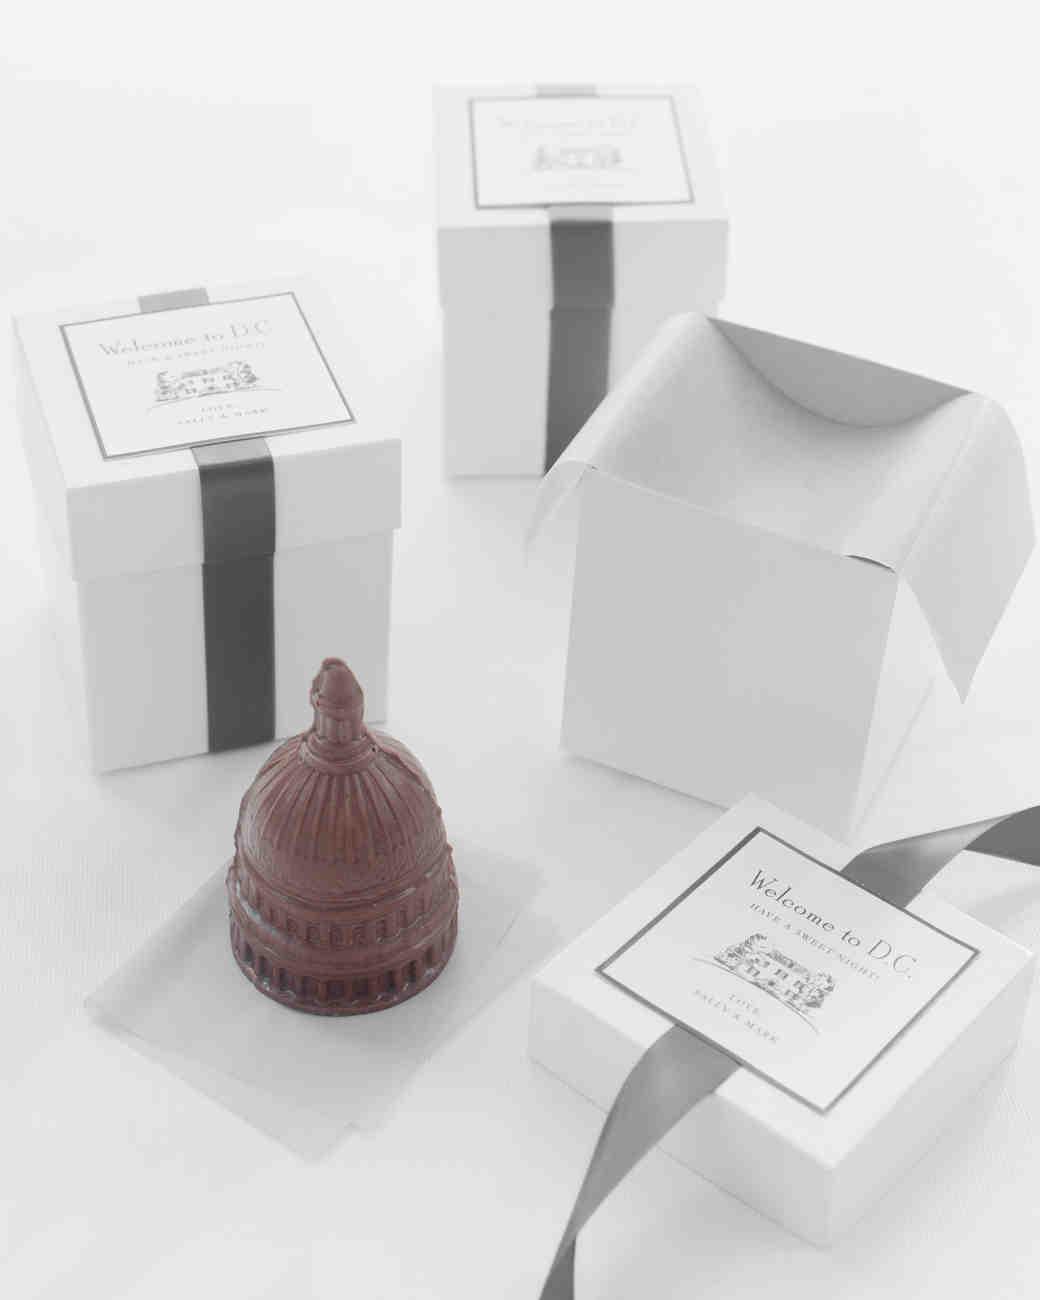 chocolate-capitol-building-turndown-service-1-mwd110629.jpg